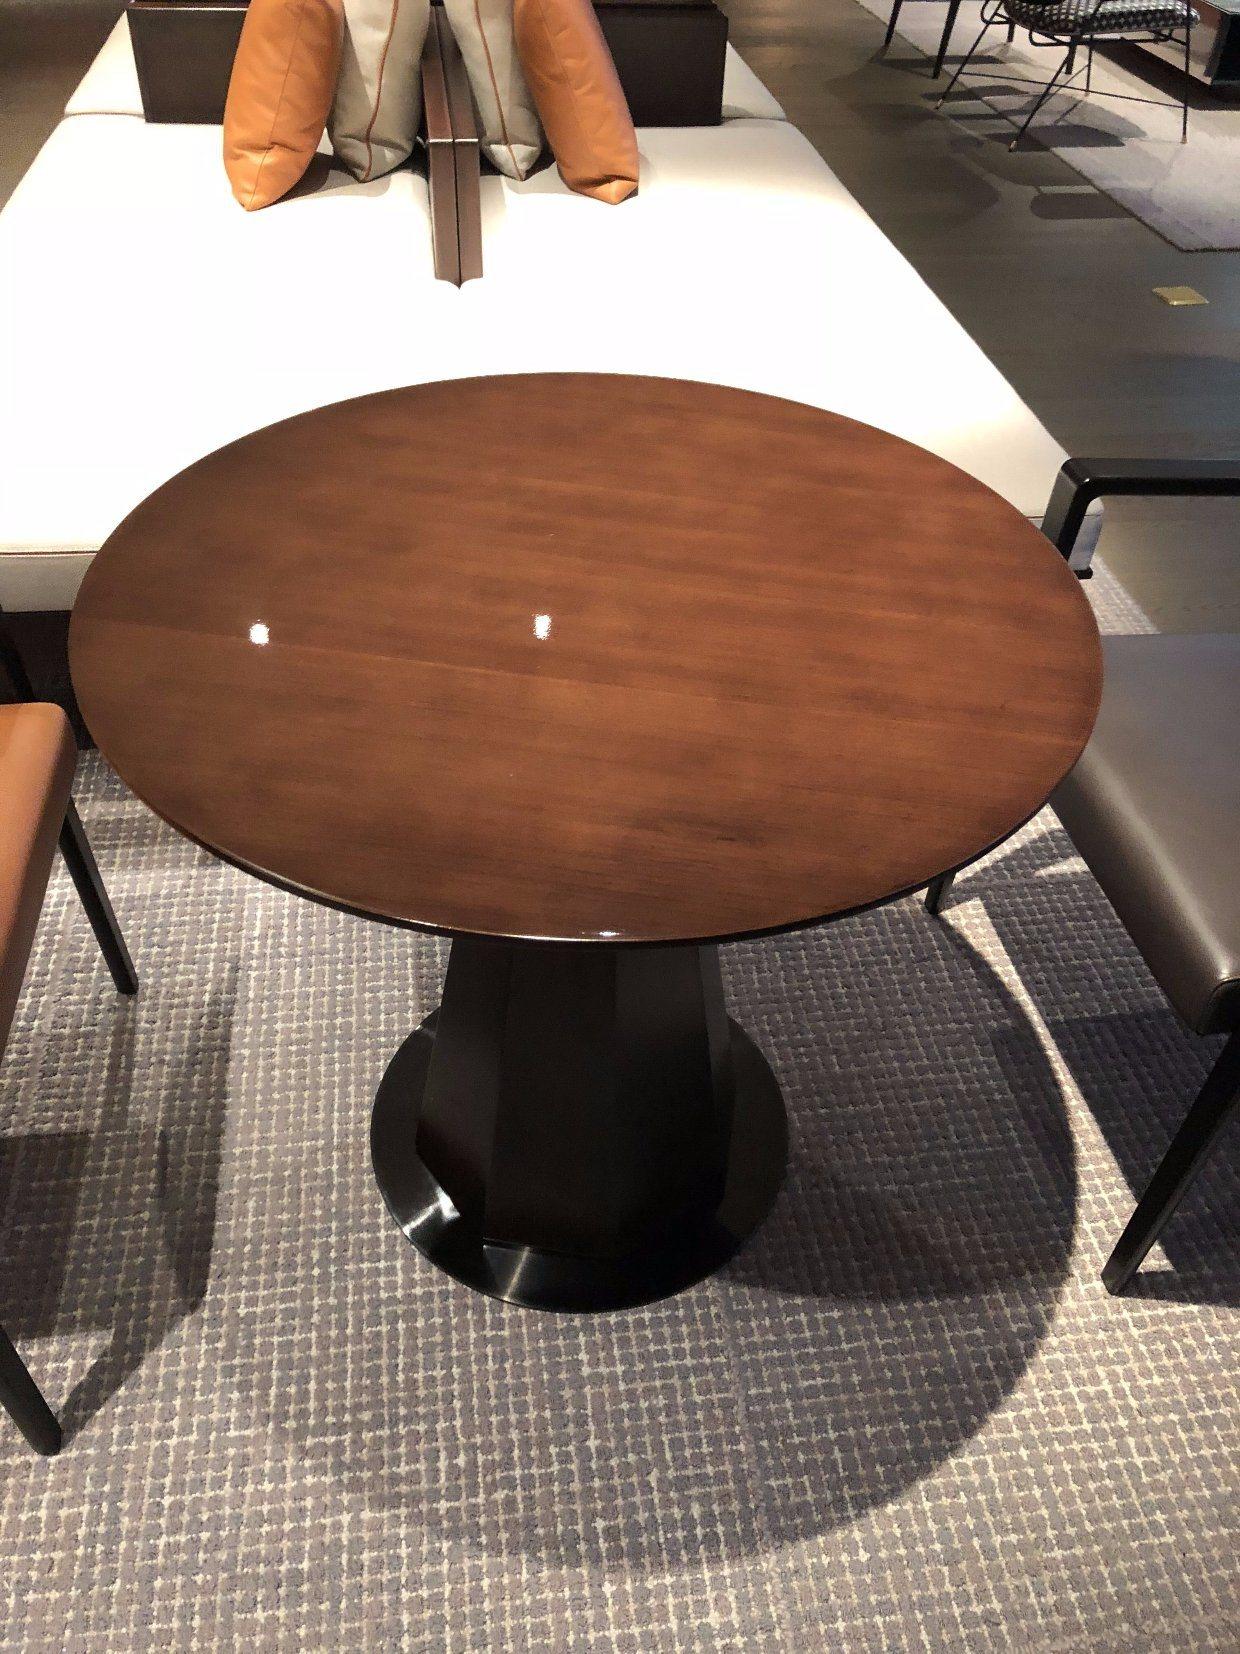 Restaurant Furniture Sets/Hotel Furniture Sets/Dining Furniture/Table and Chair (GLDT--0109820)